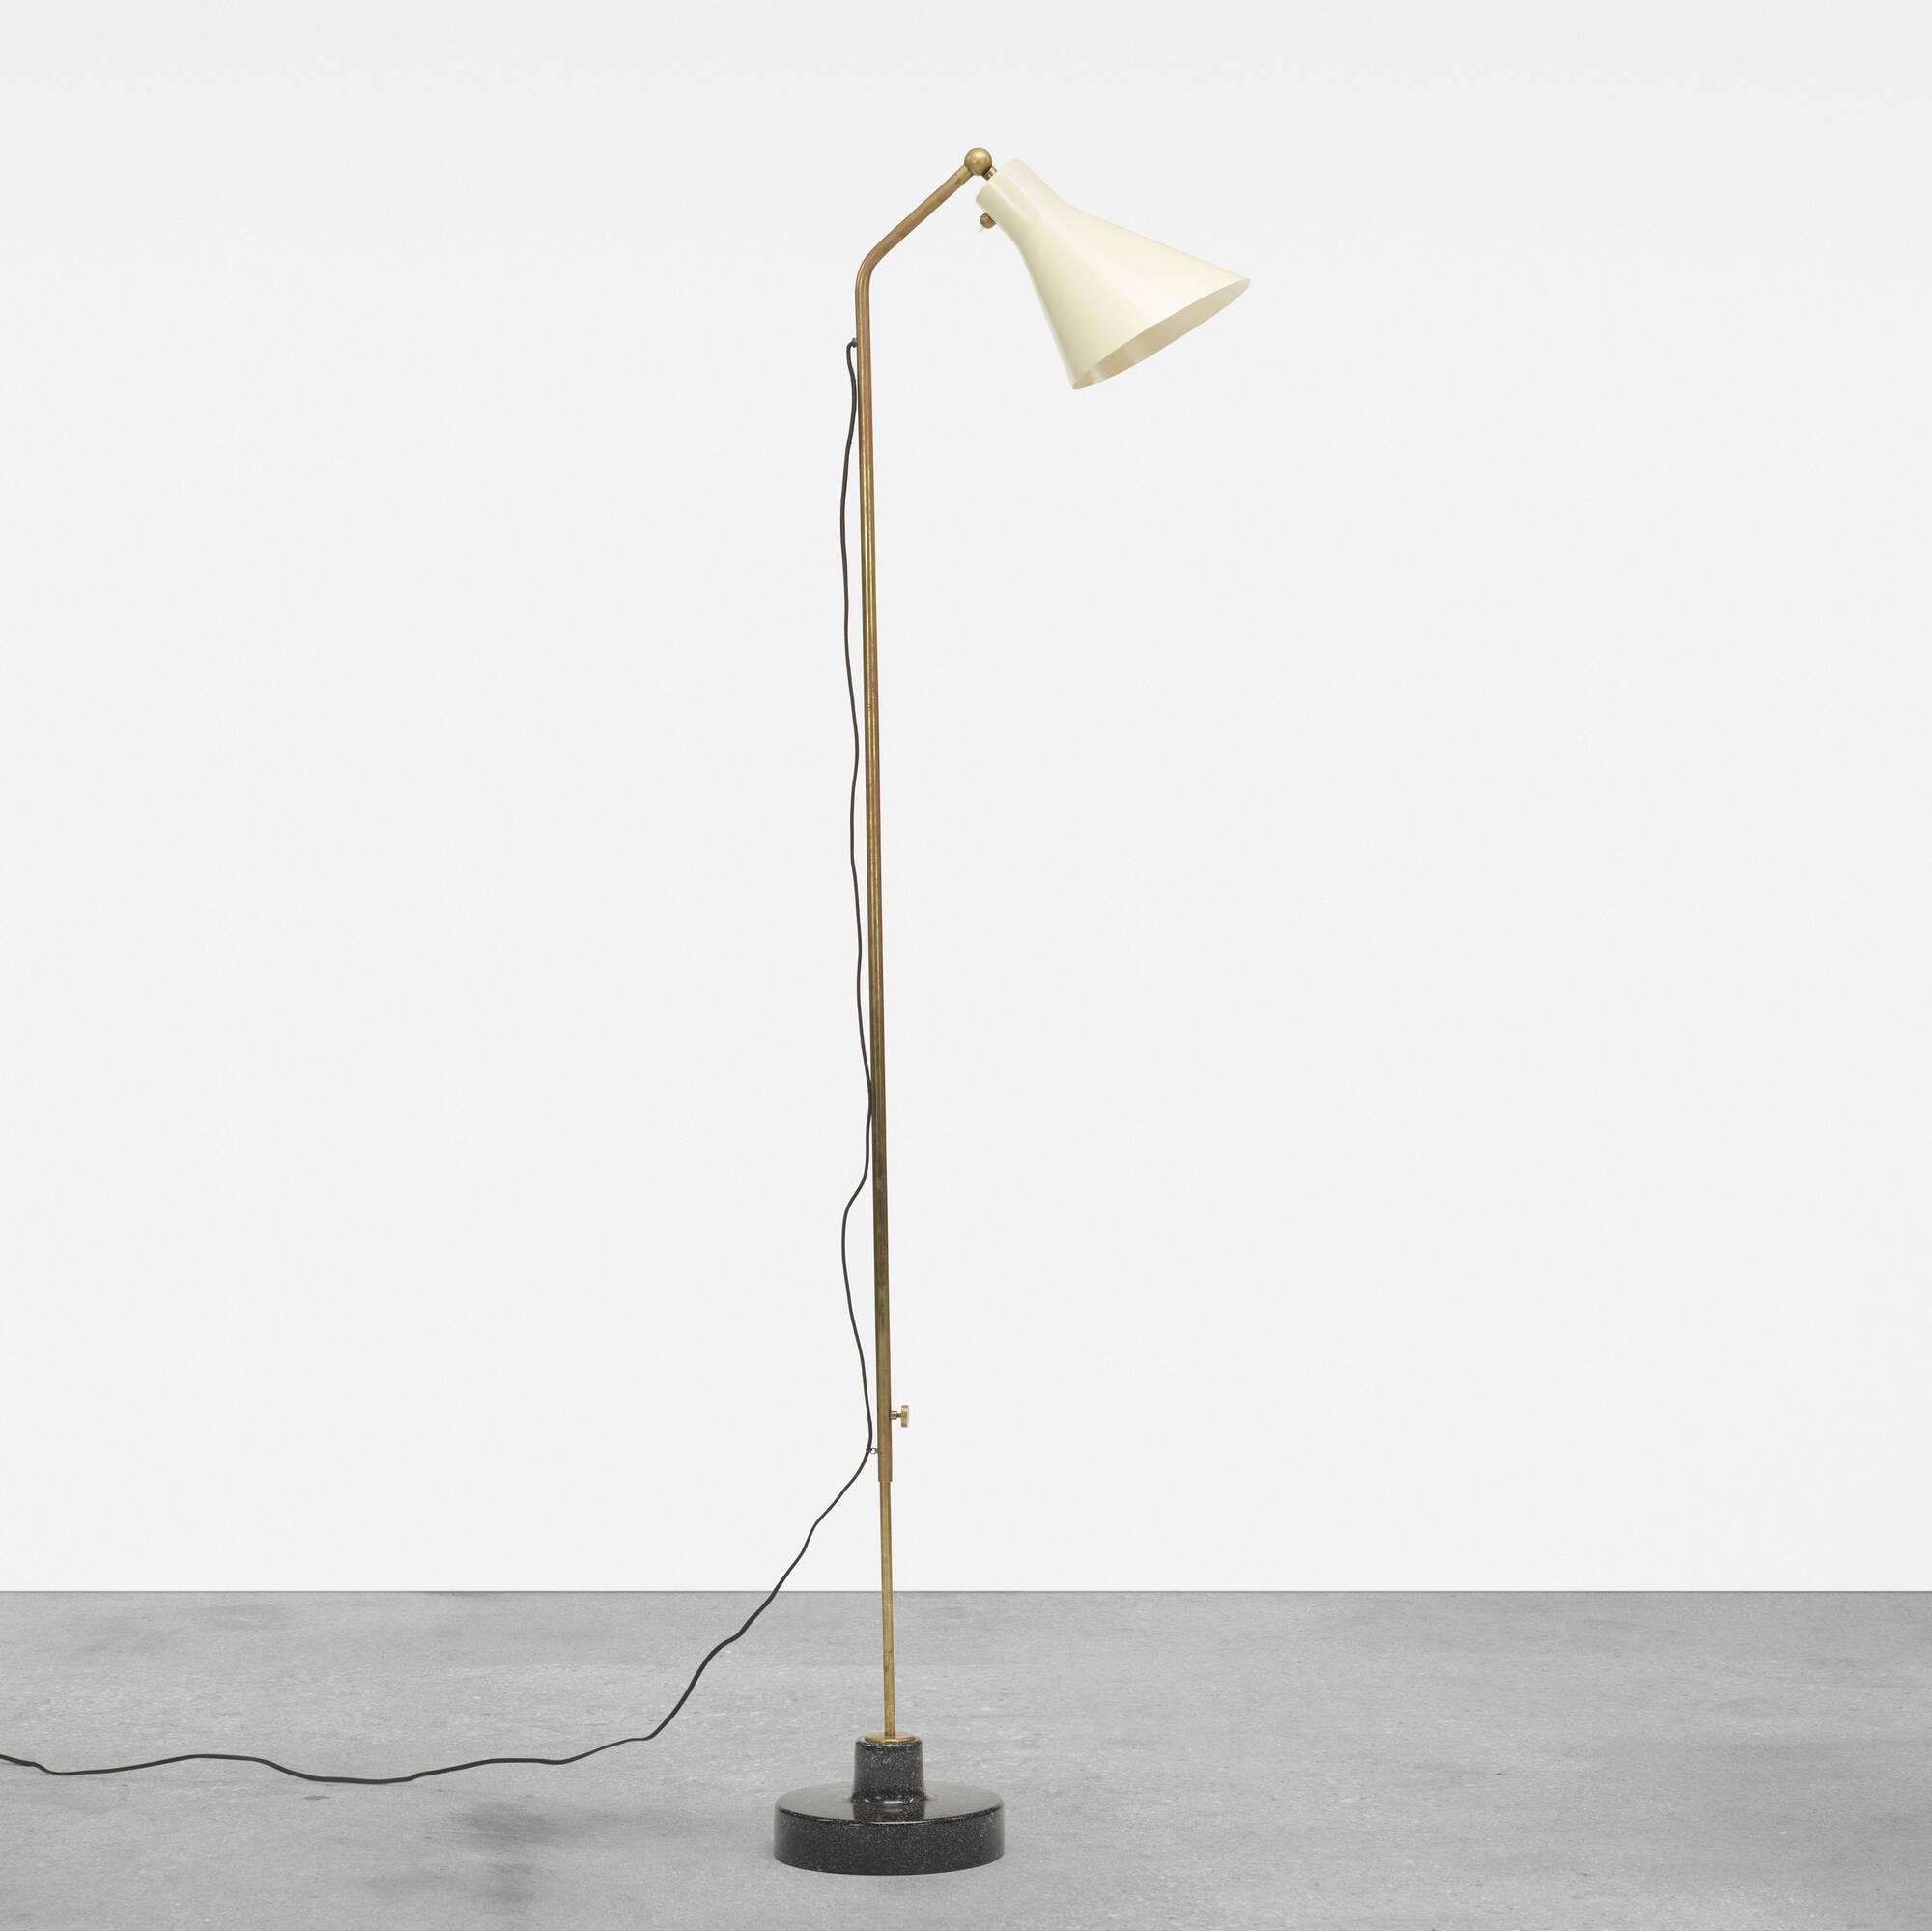 222: Ignazio Gardella / Lte 3 adjustable floor lamp (1 of 2)